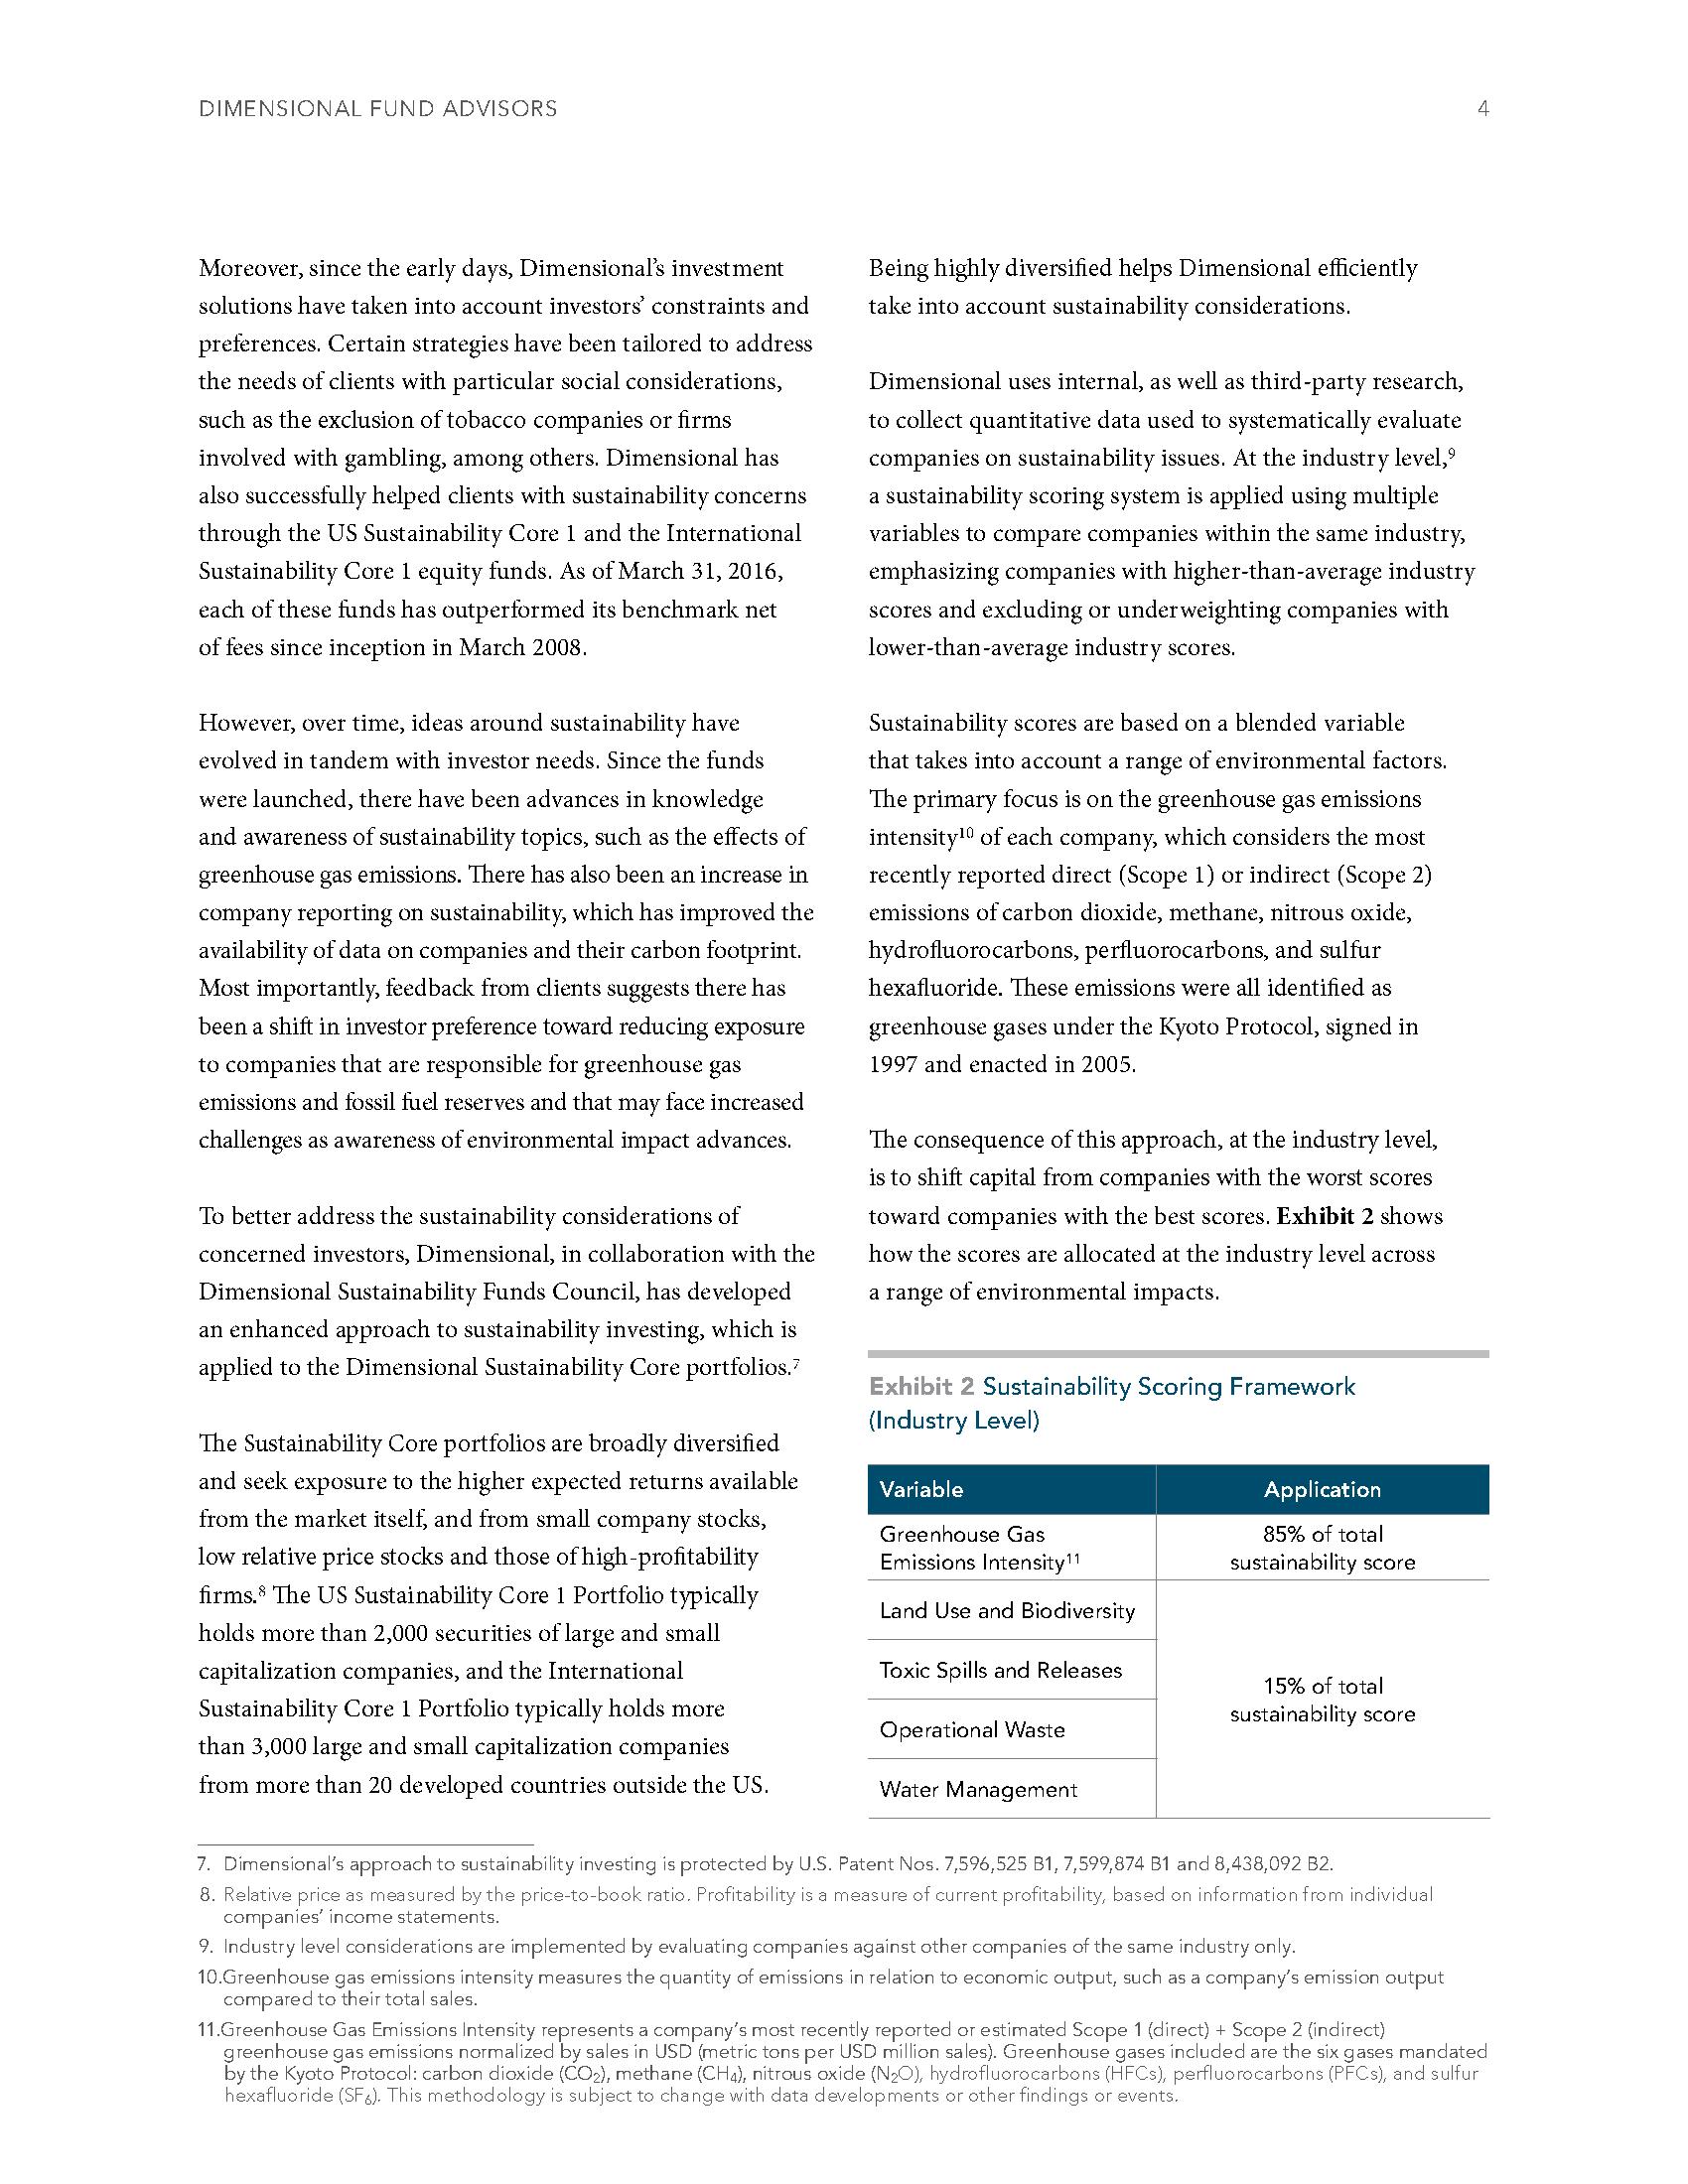 Sustainability Investing CFP DFA 4